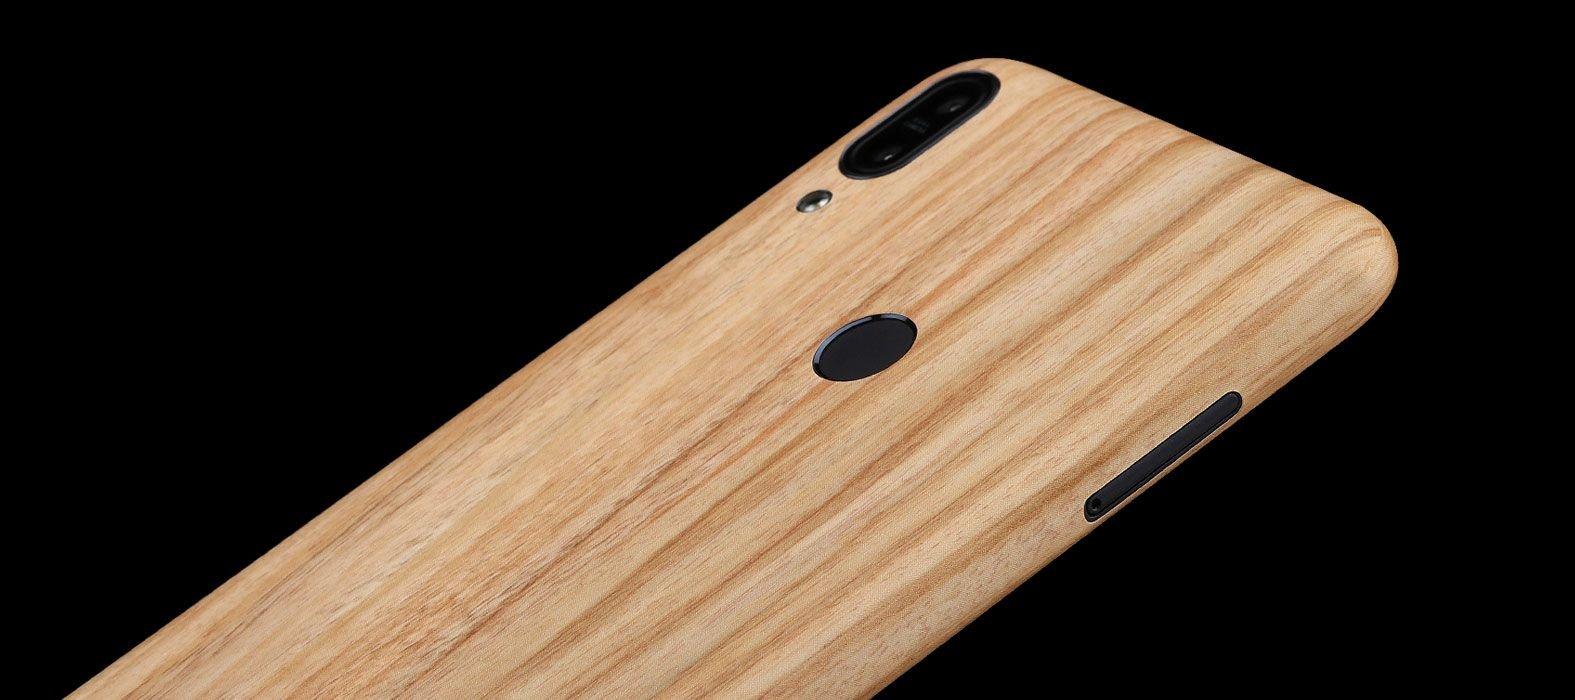 Asus Zenfone Max Pro M1 Skins